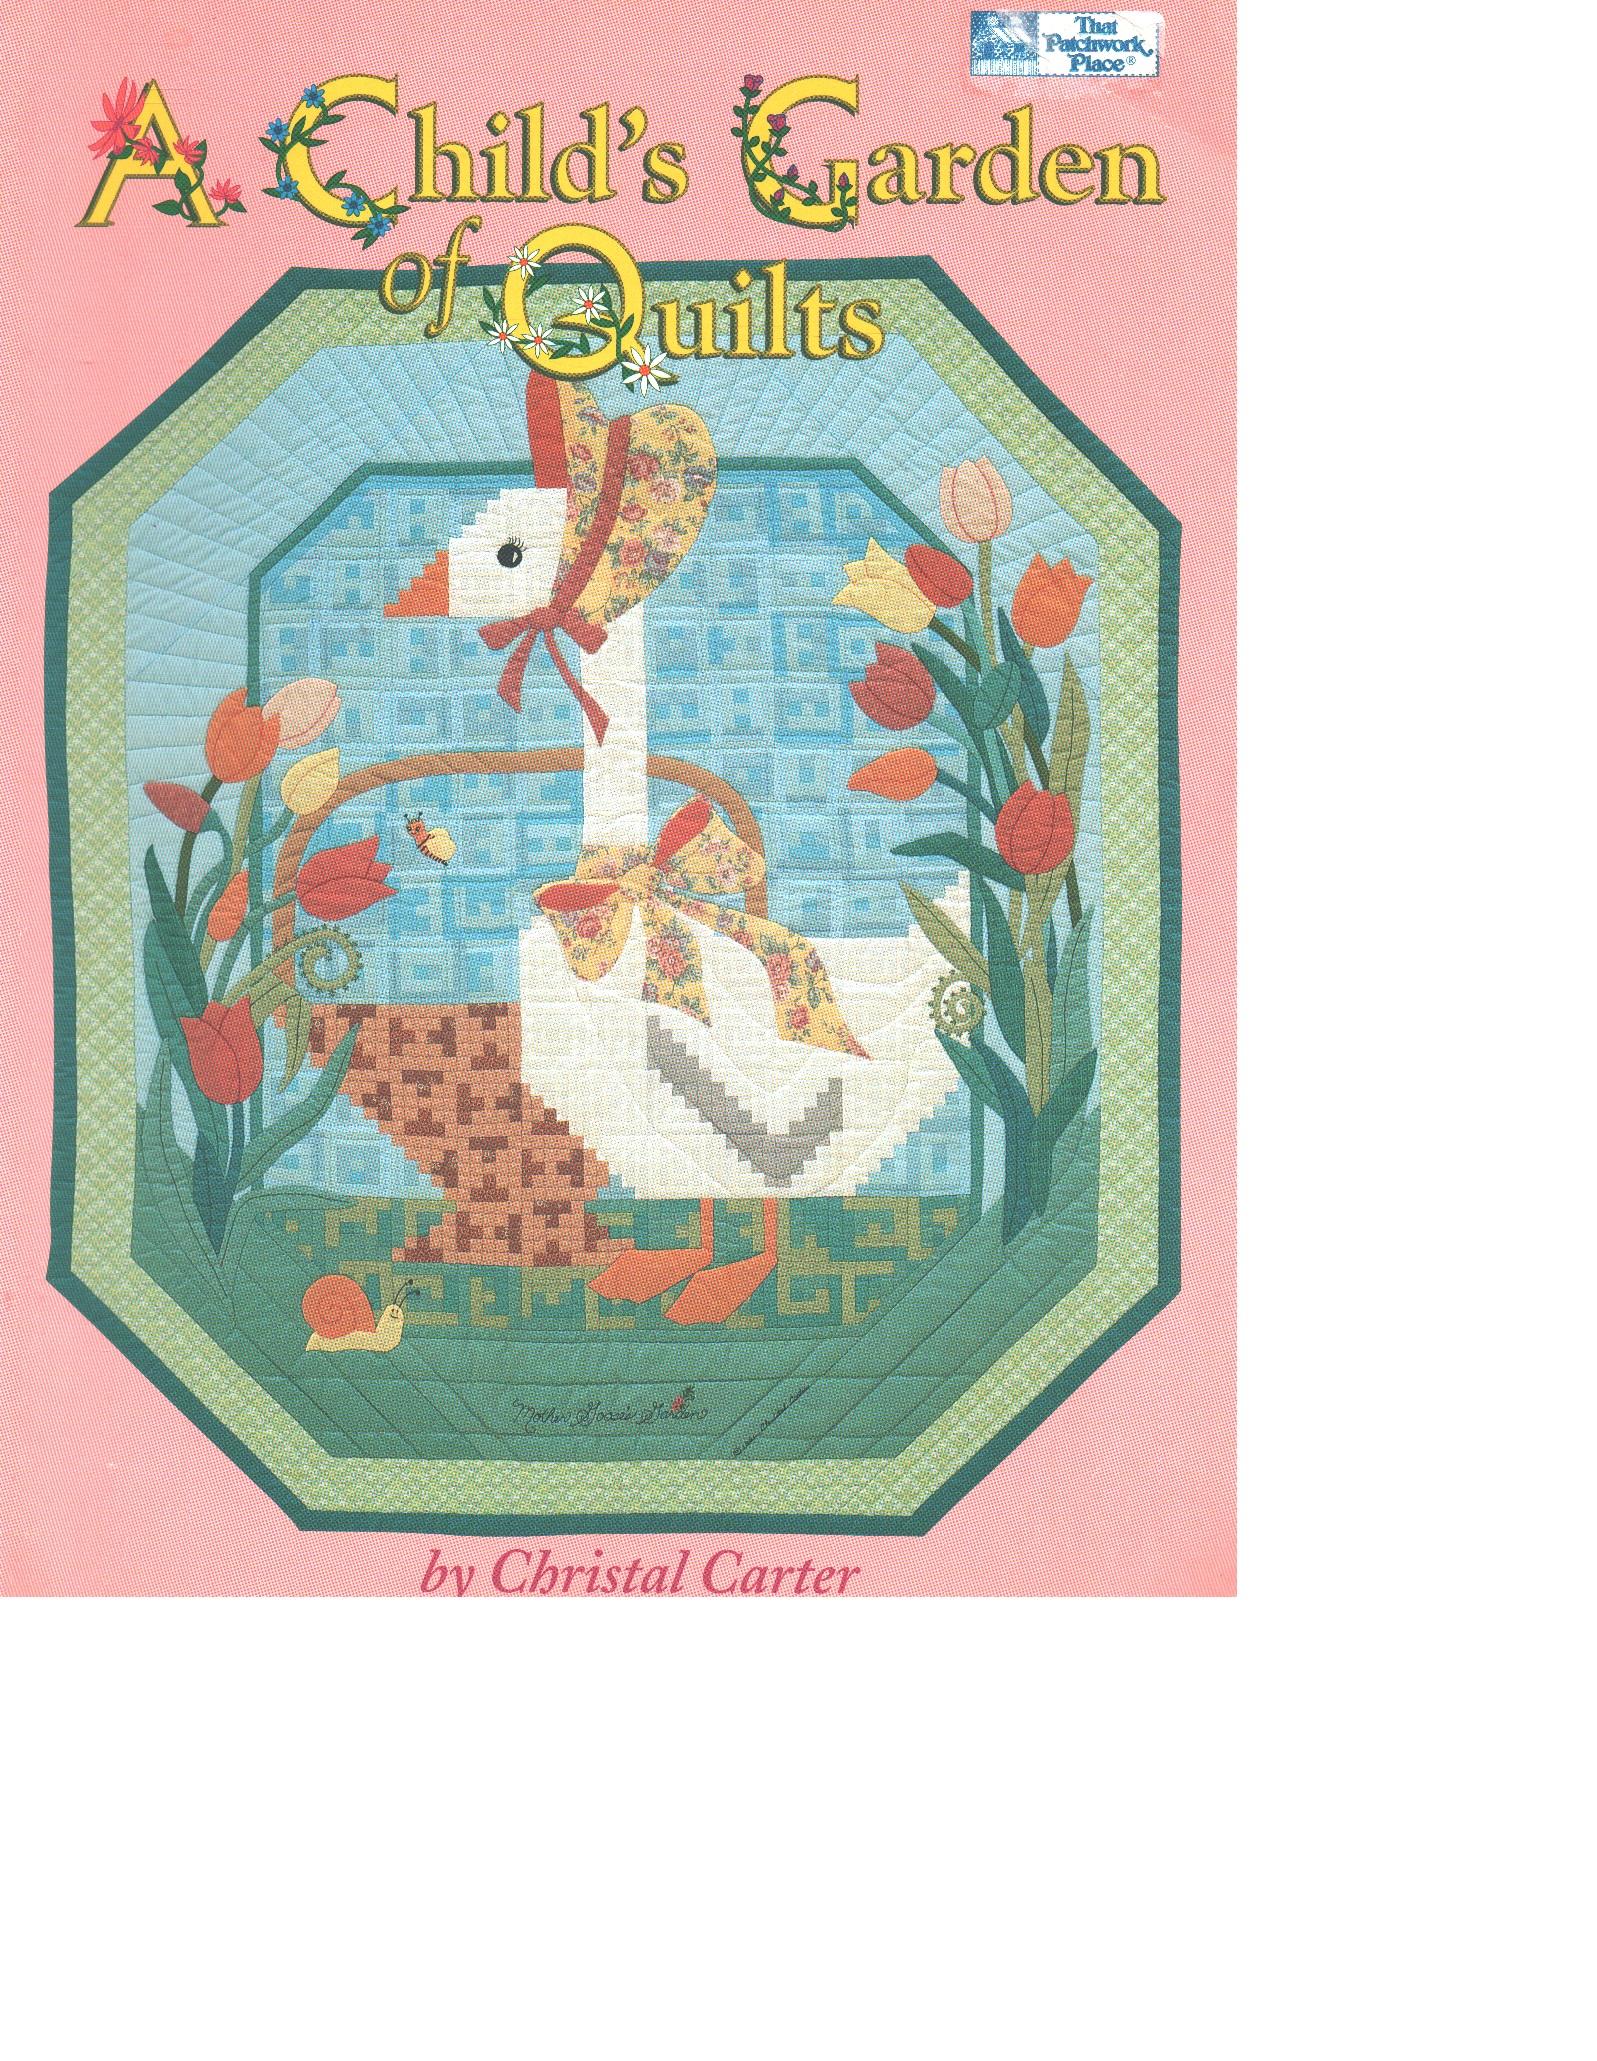 A Child's Garden of Quilts - Carter, Christal